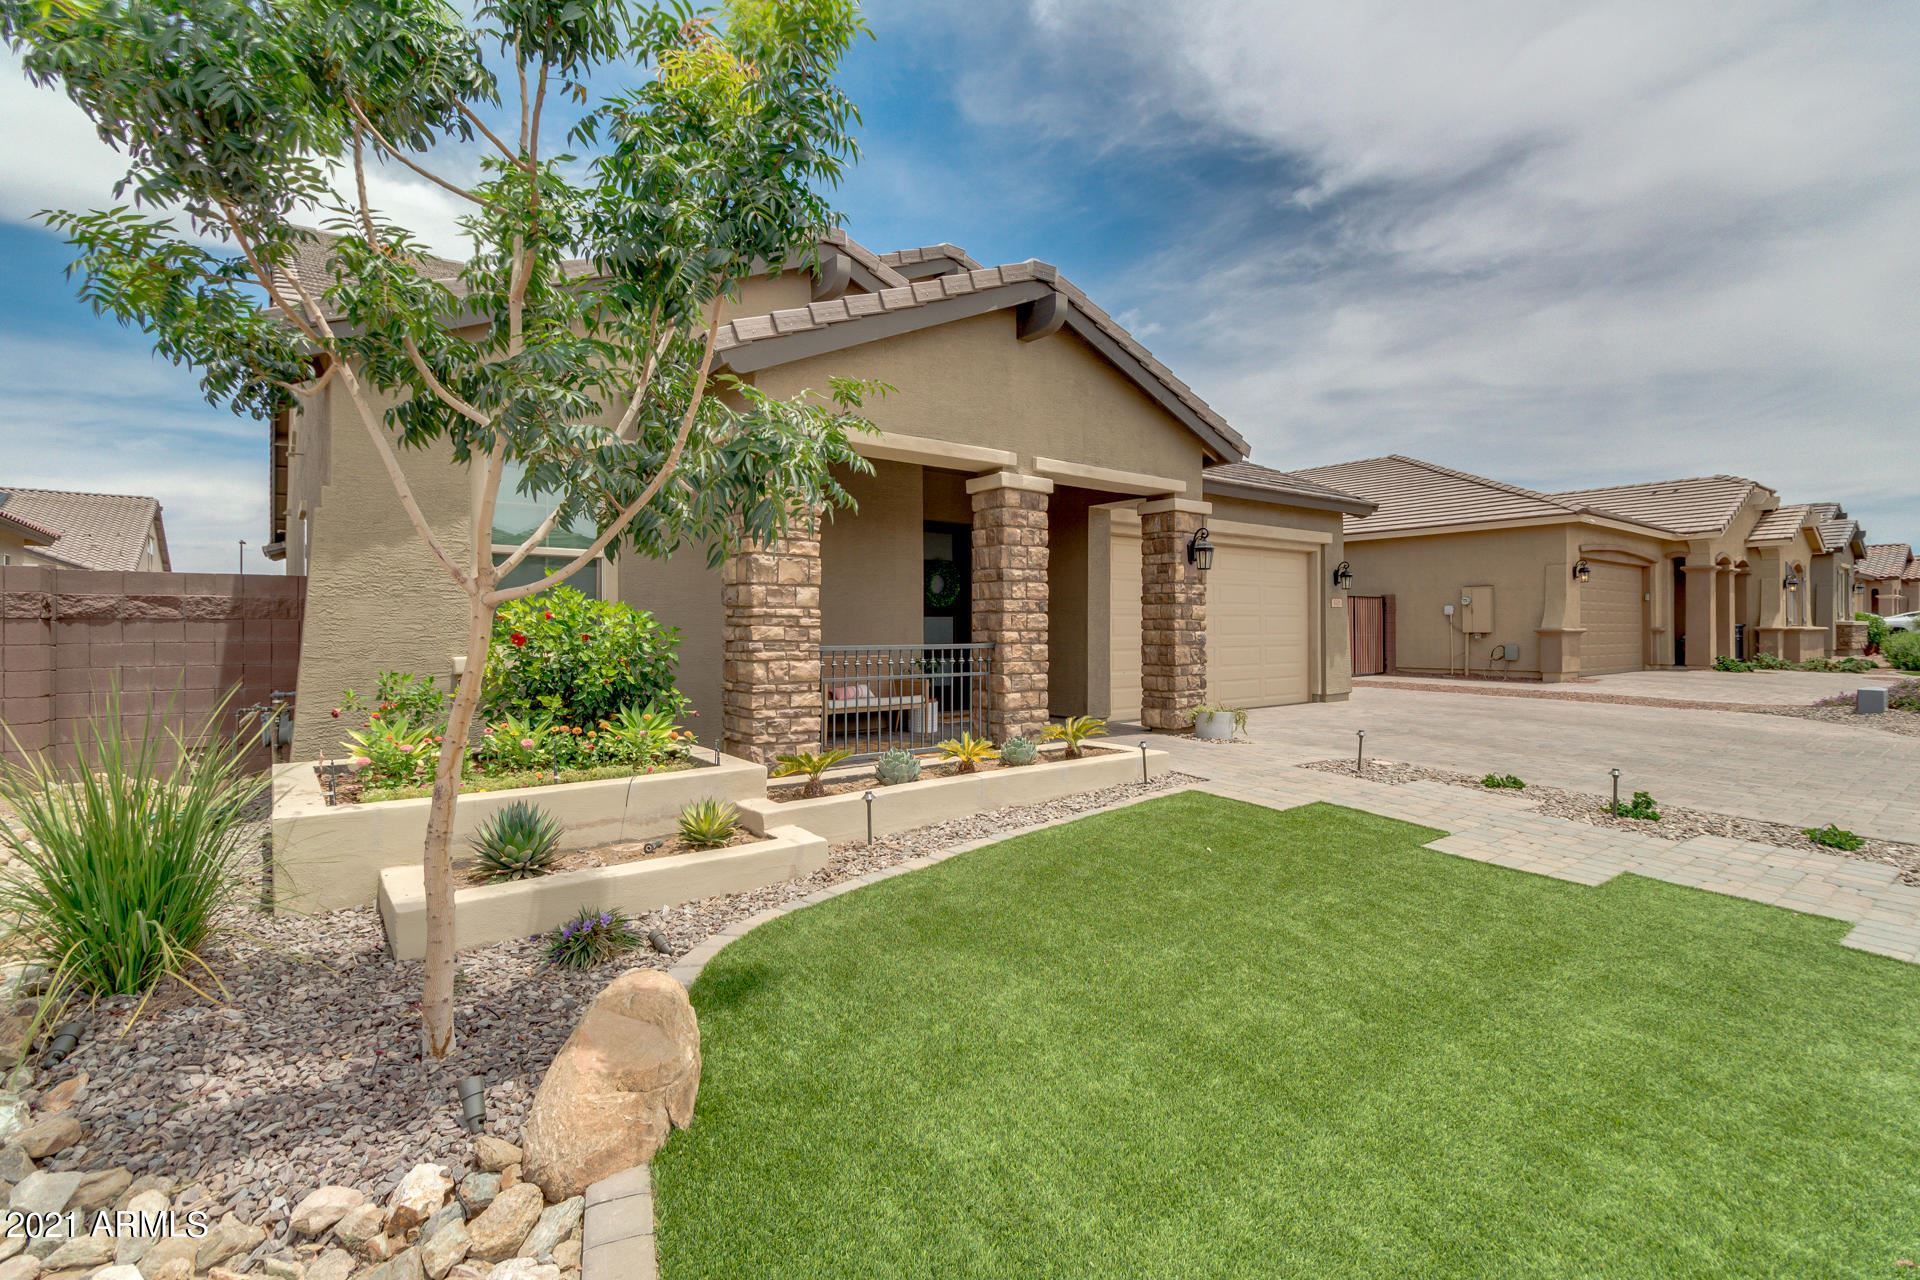 Photo of 1418 W Alpine Tree Avenue, Queen Creek, AZ 85140 (MLS # 6247398)